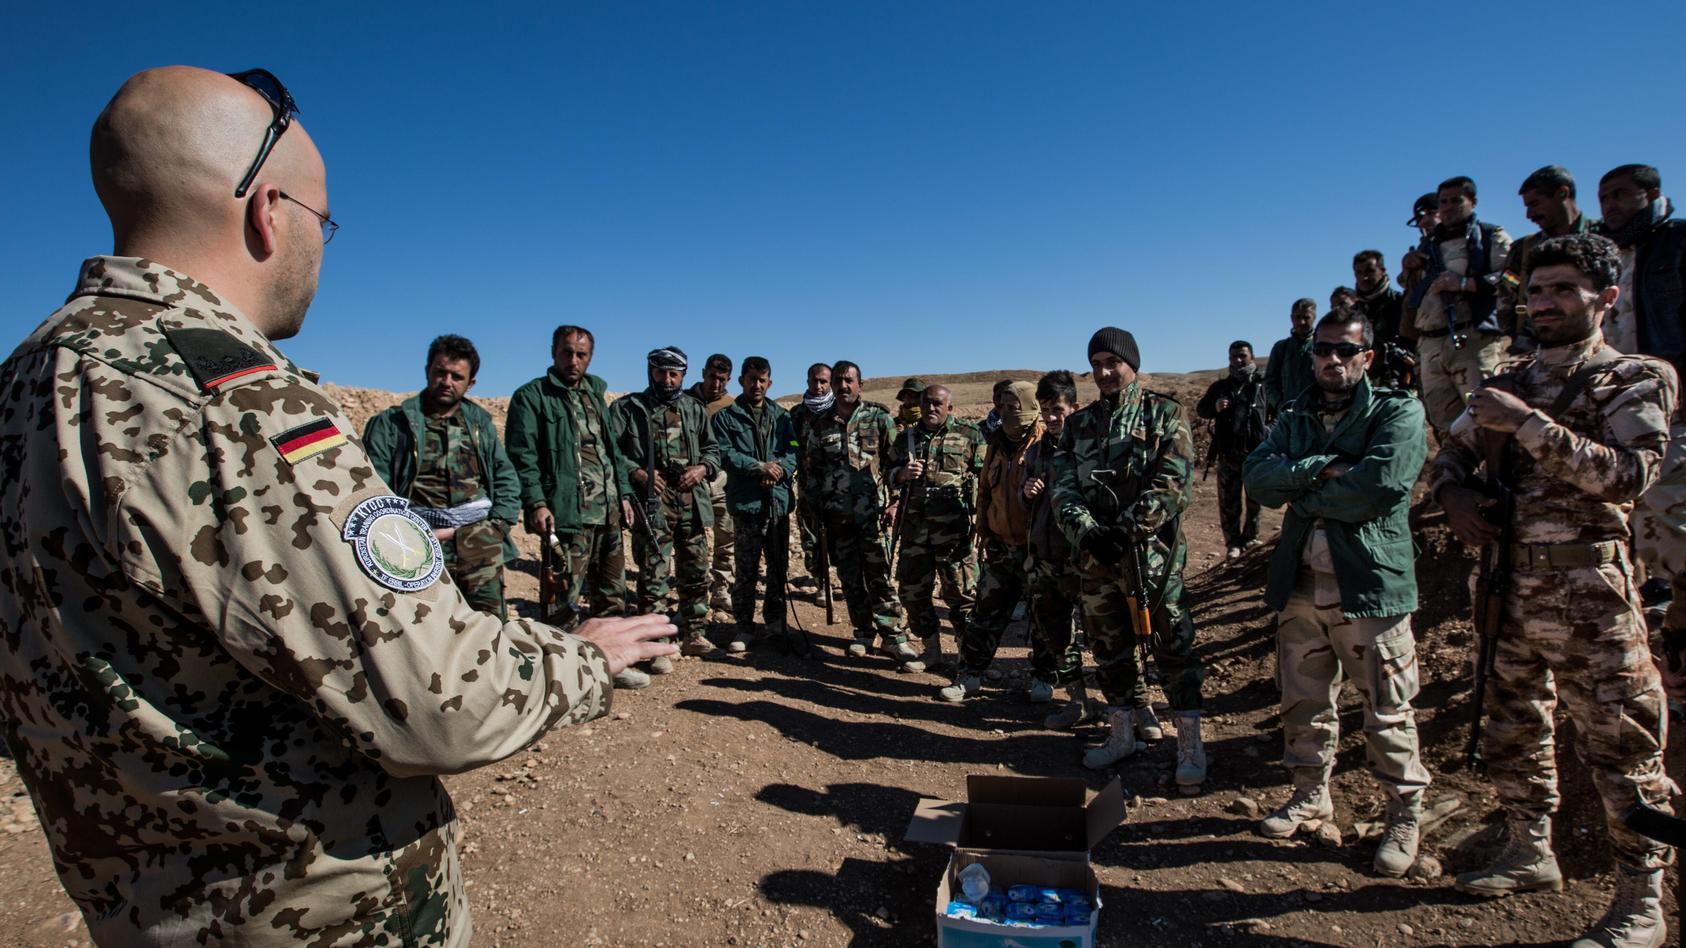 Deutsche Soldaten bilden kurdische Peshmerga Einheiten bei Erbil im Nordirak Kurdistan aus